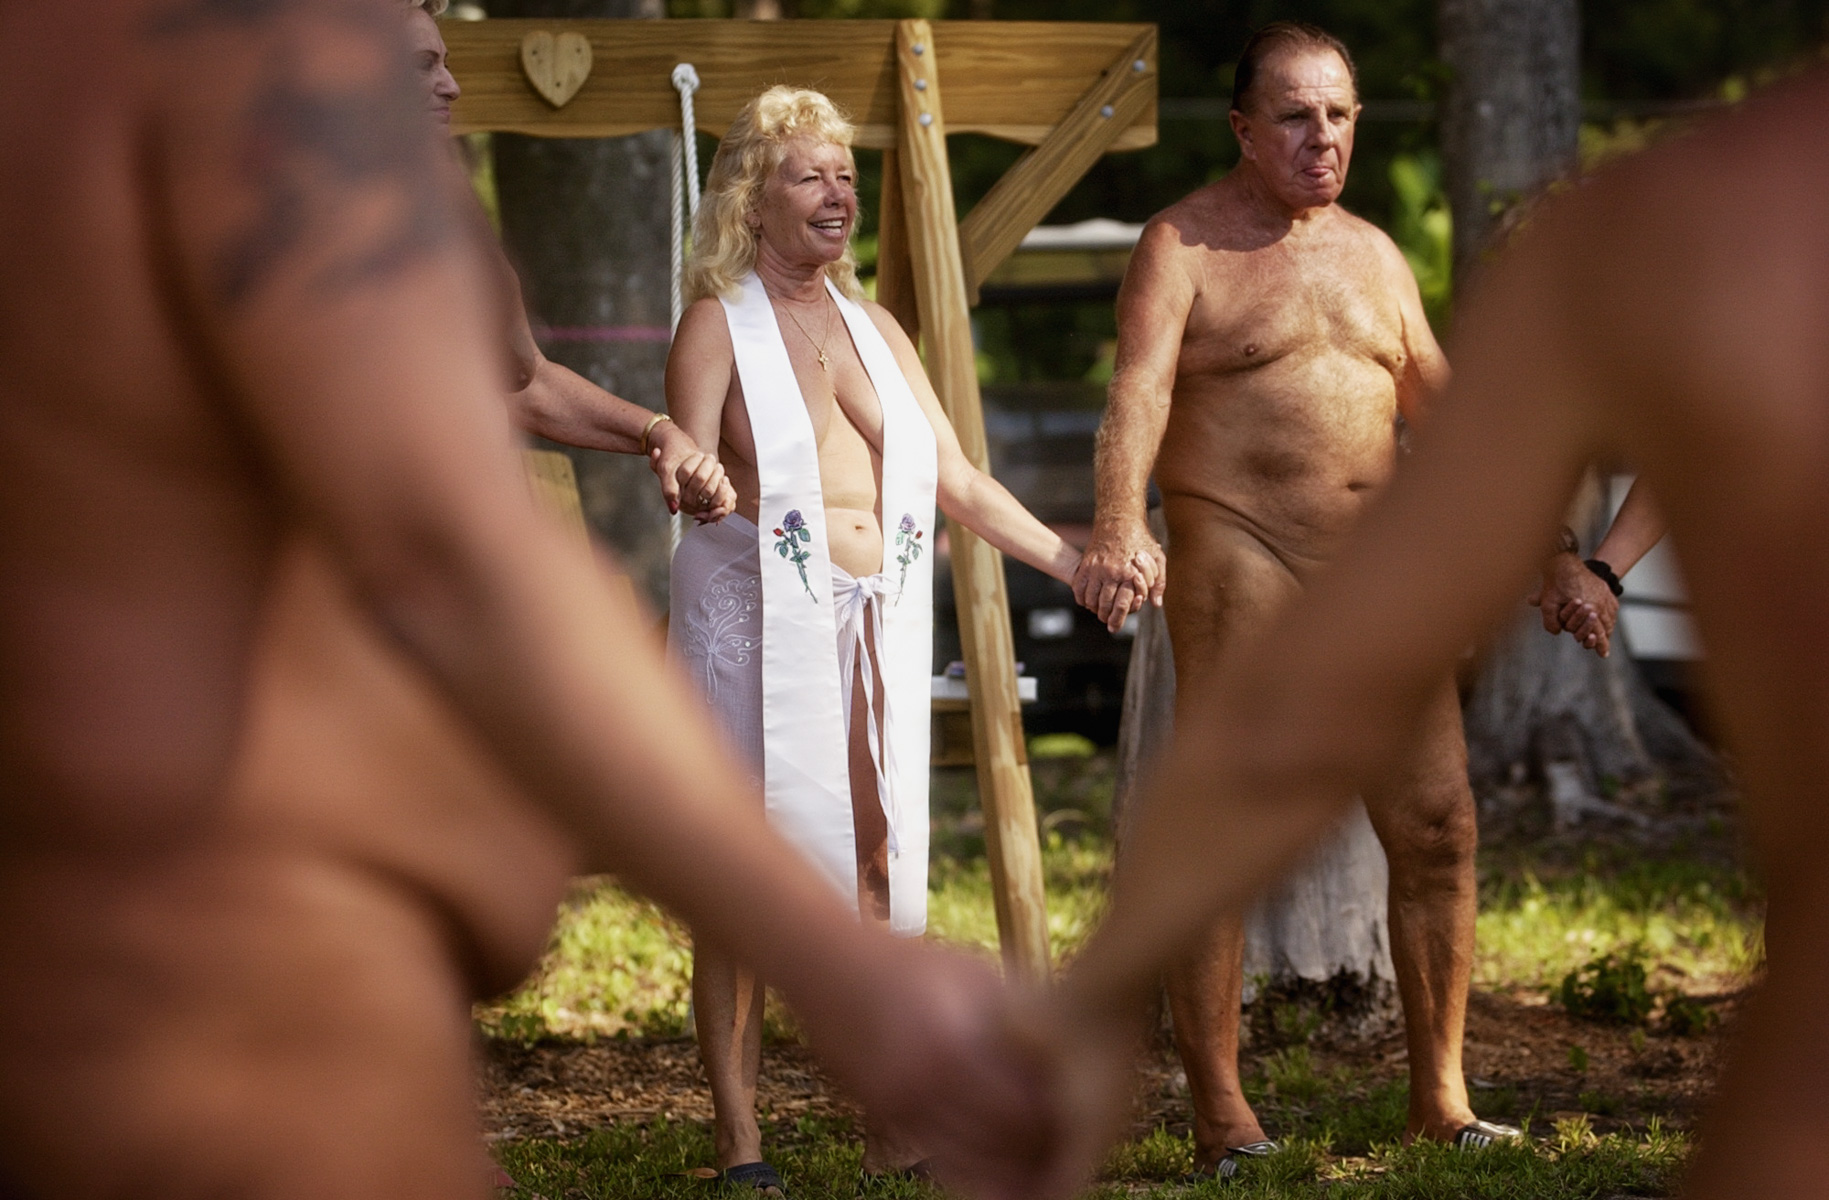 nude-worship-service-1.jpg